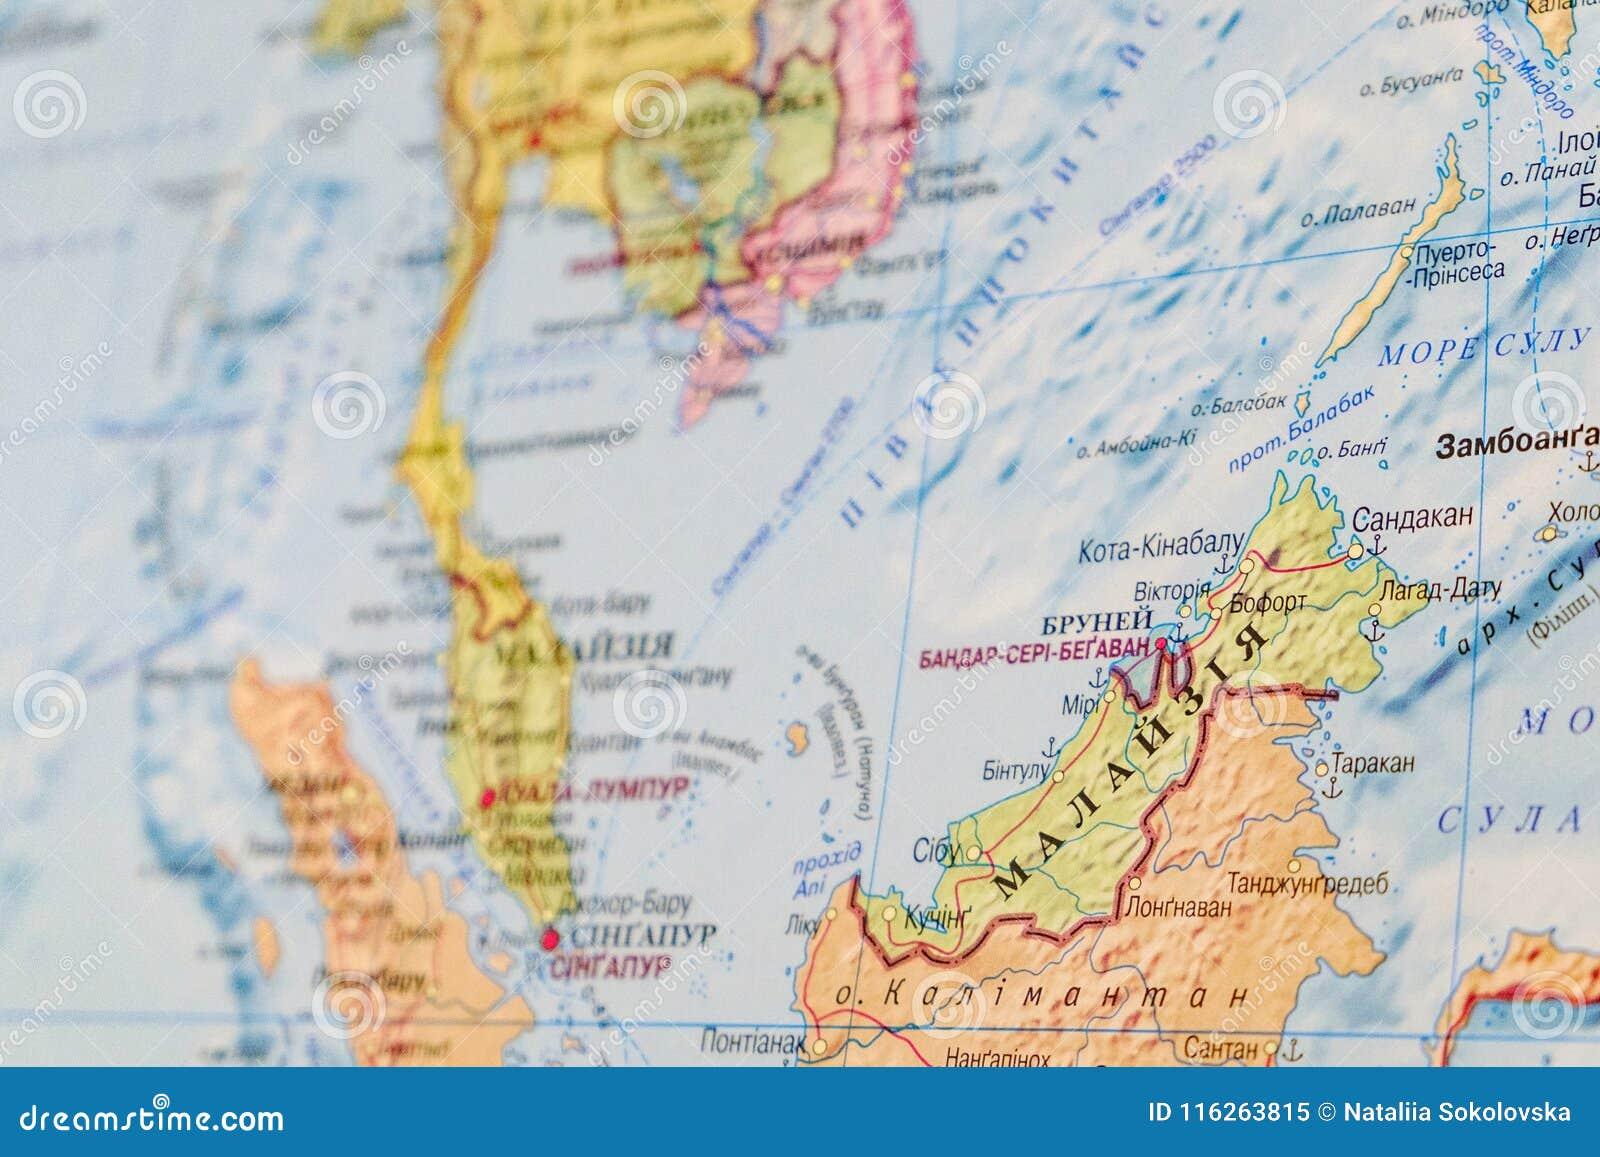 Carte Malaisie Monde.Vue De La Malaisie Sur La Carte Du Monde Carte Russe Image